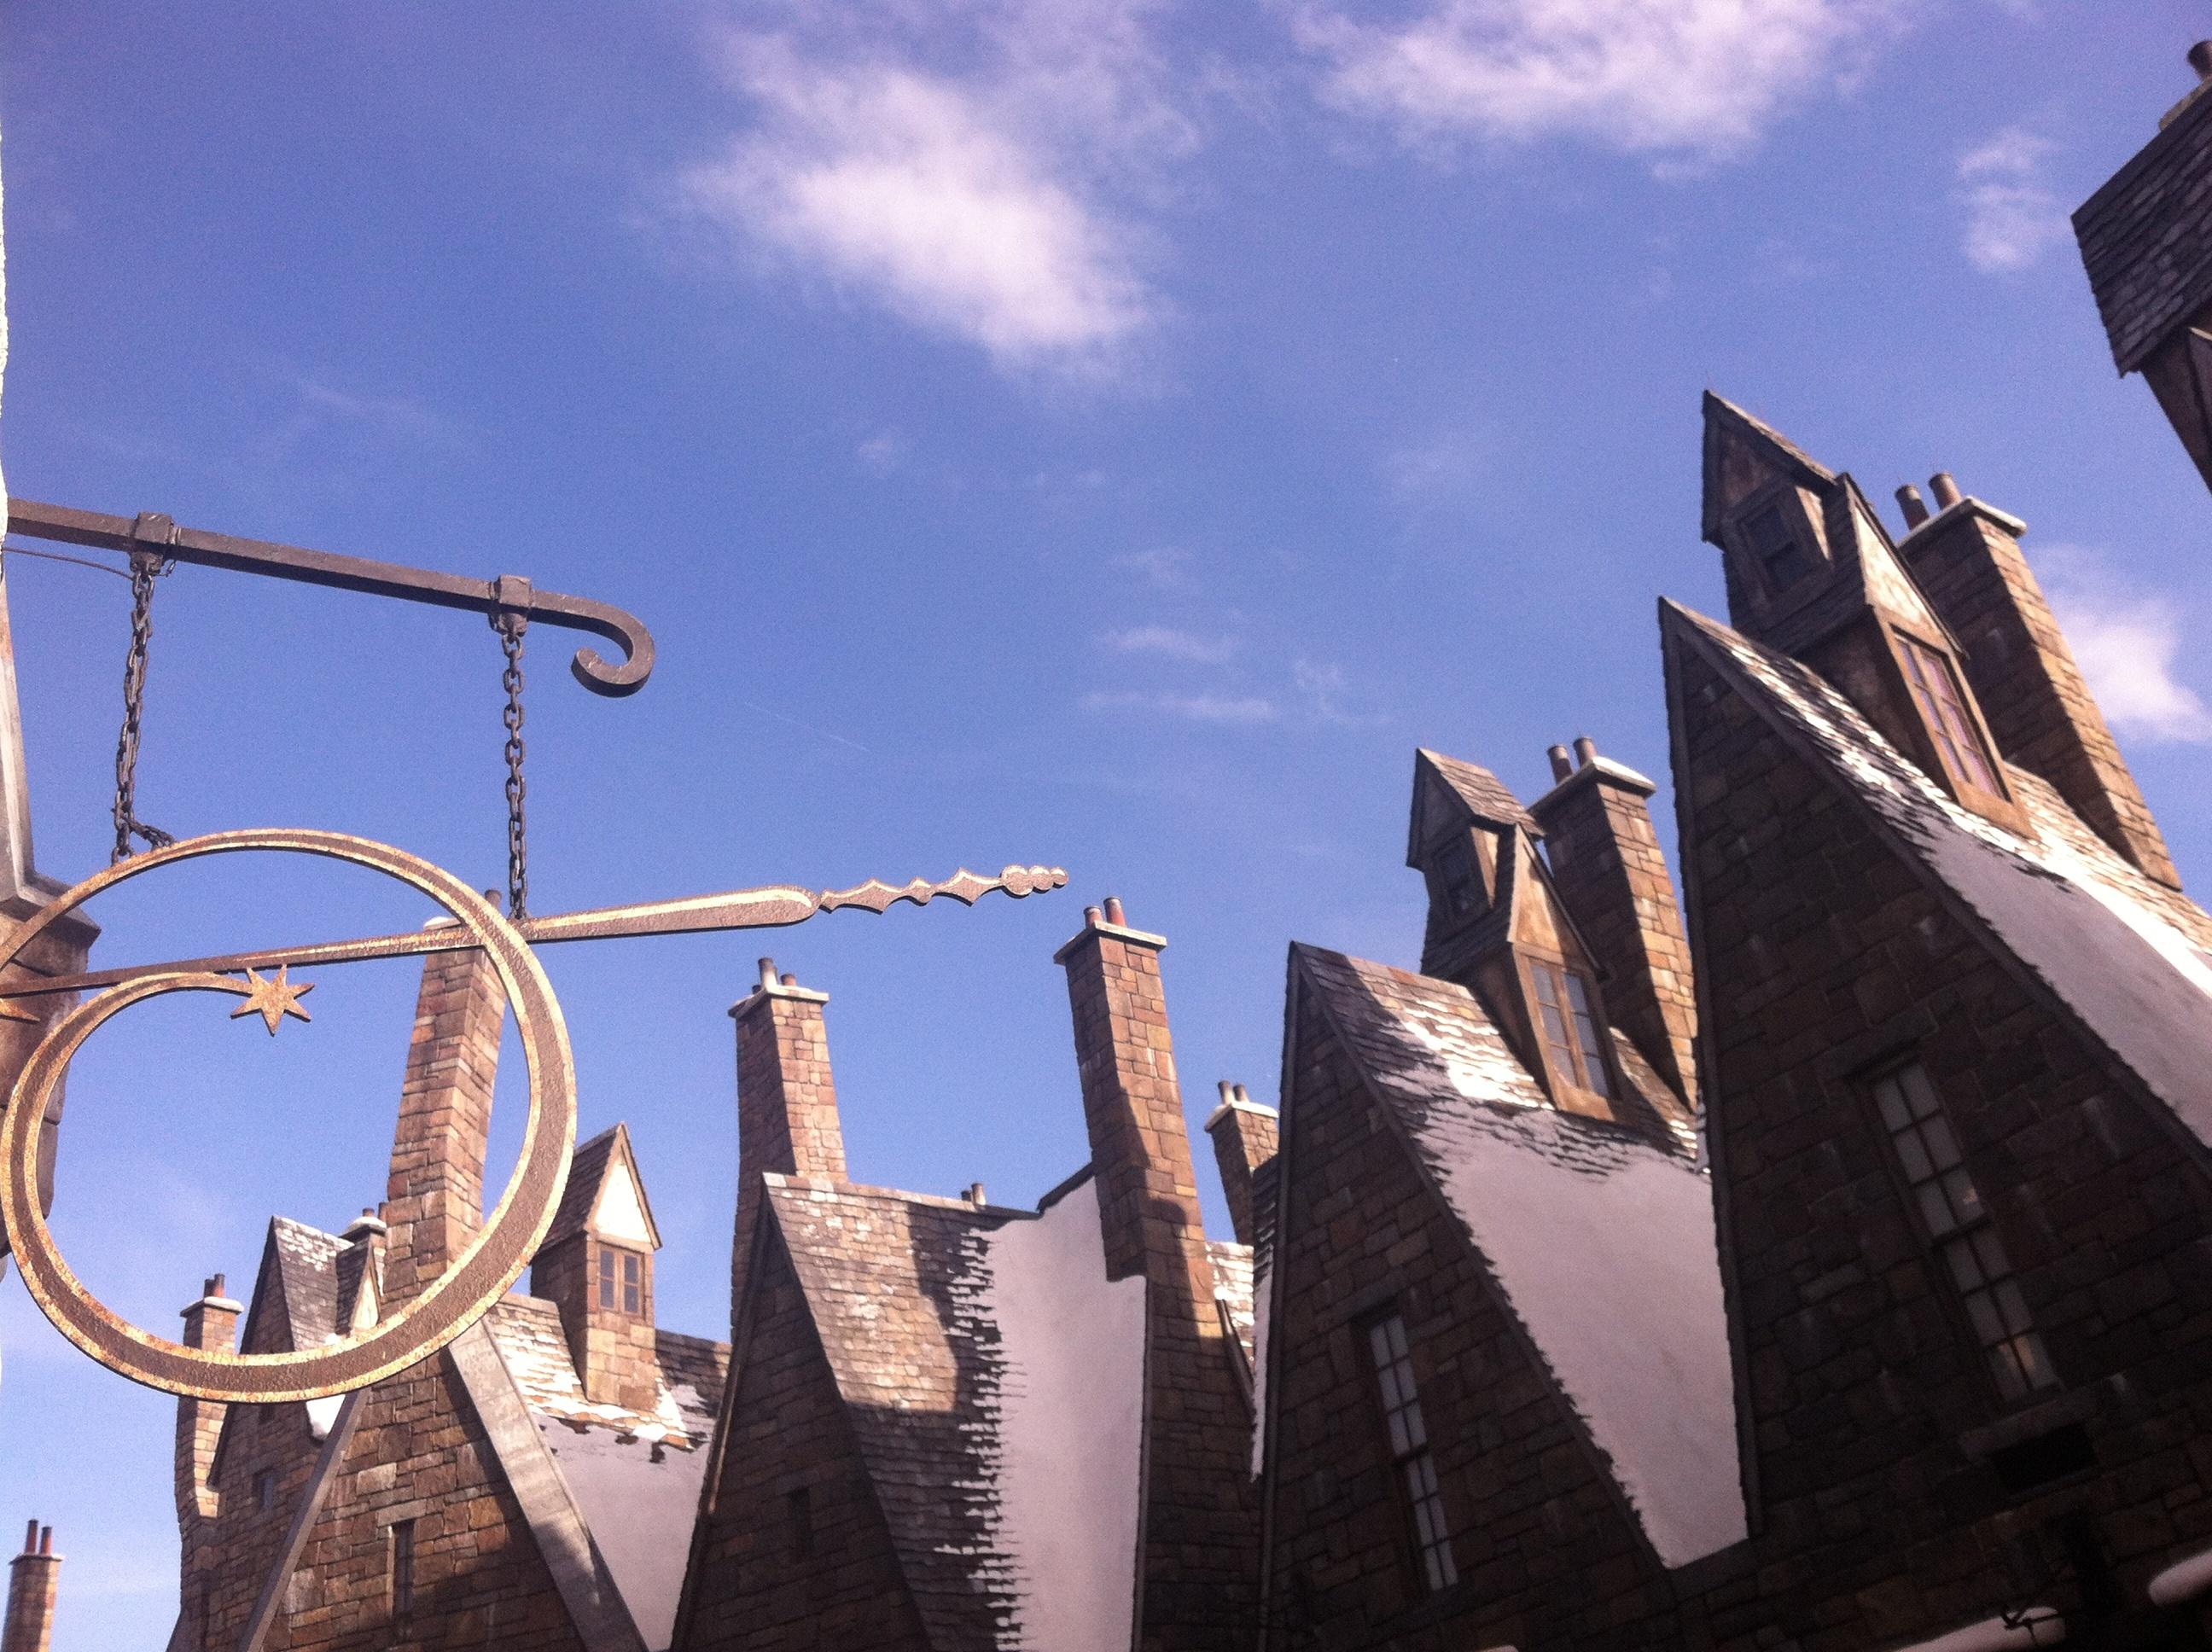 Hogsmeade Wizarding World of Harry Potter World